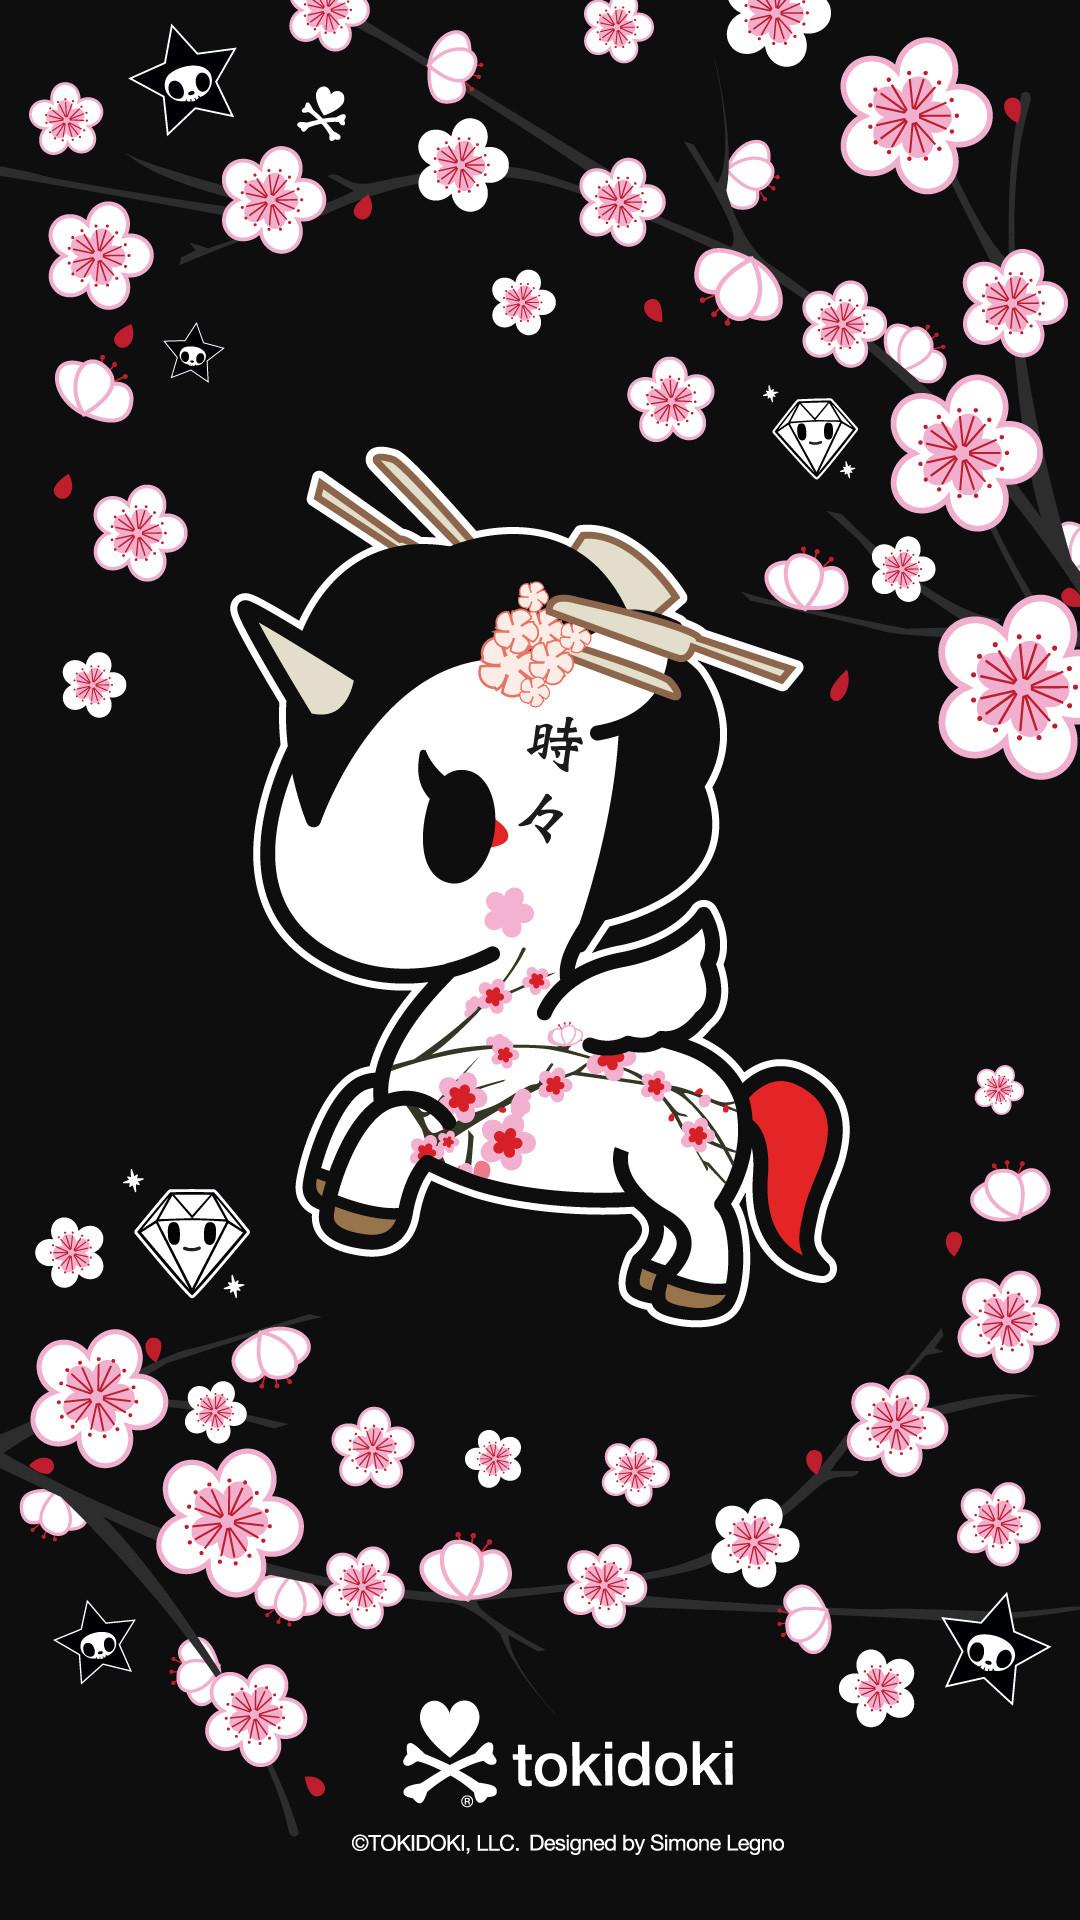 Cute Pink Cat Wallpapers Tokidoki Unicorno Wallpaper 69 Images